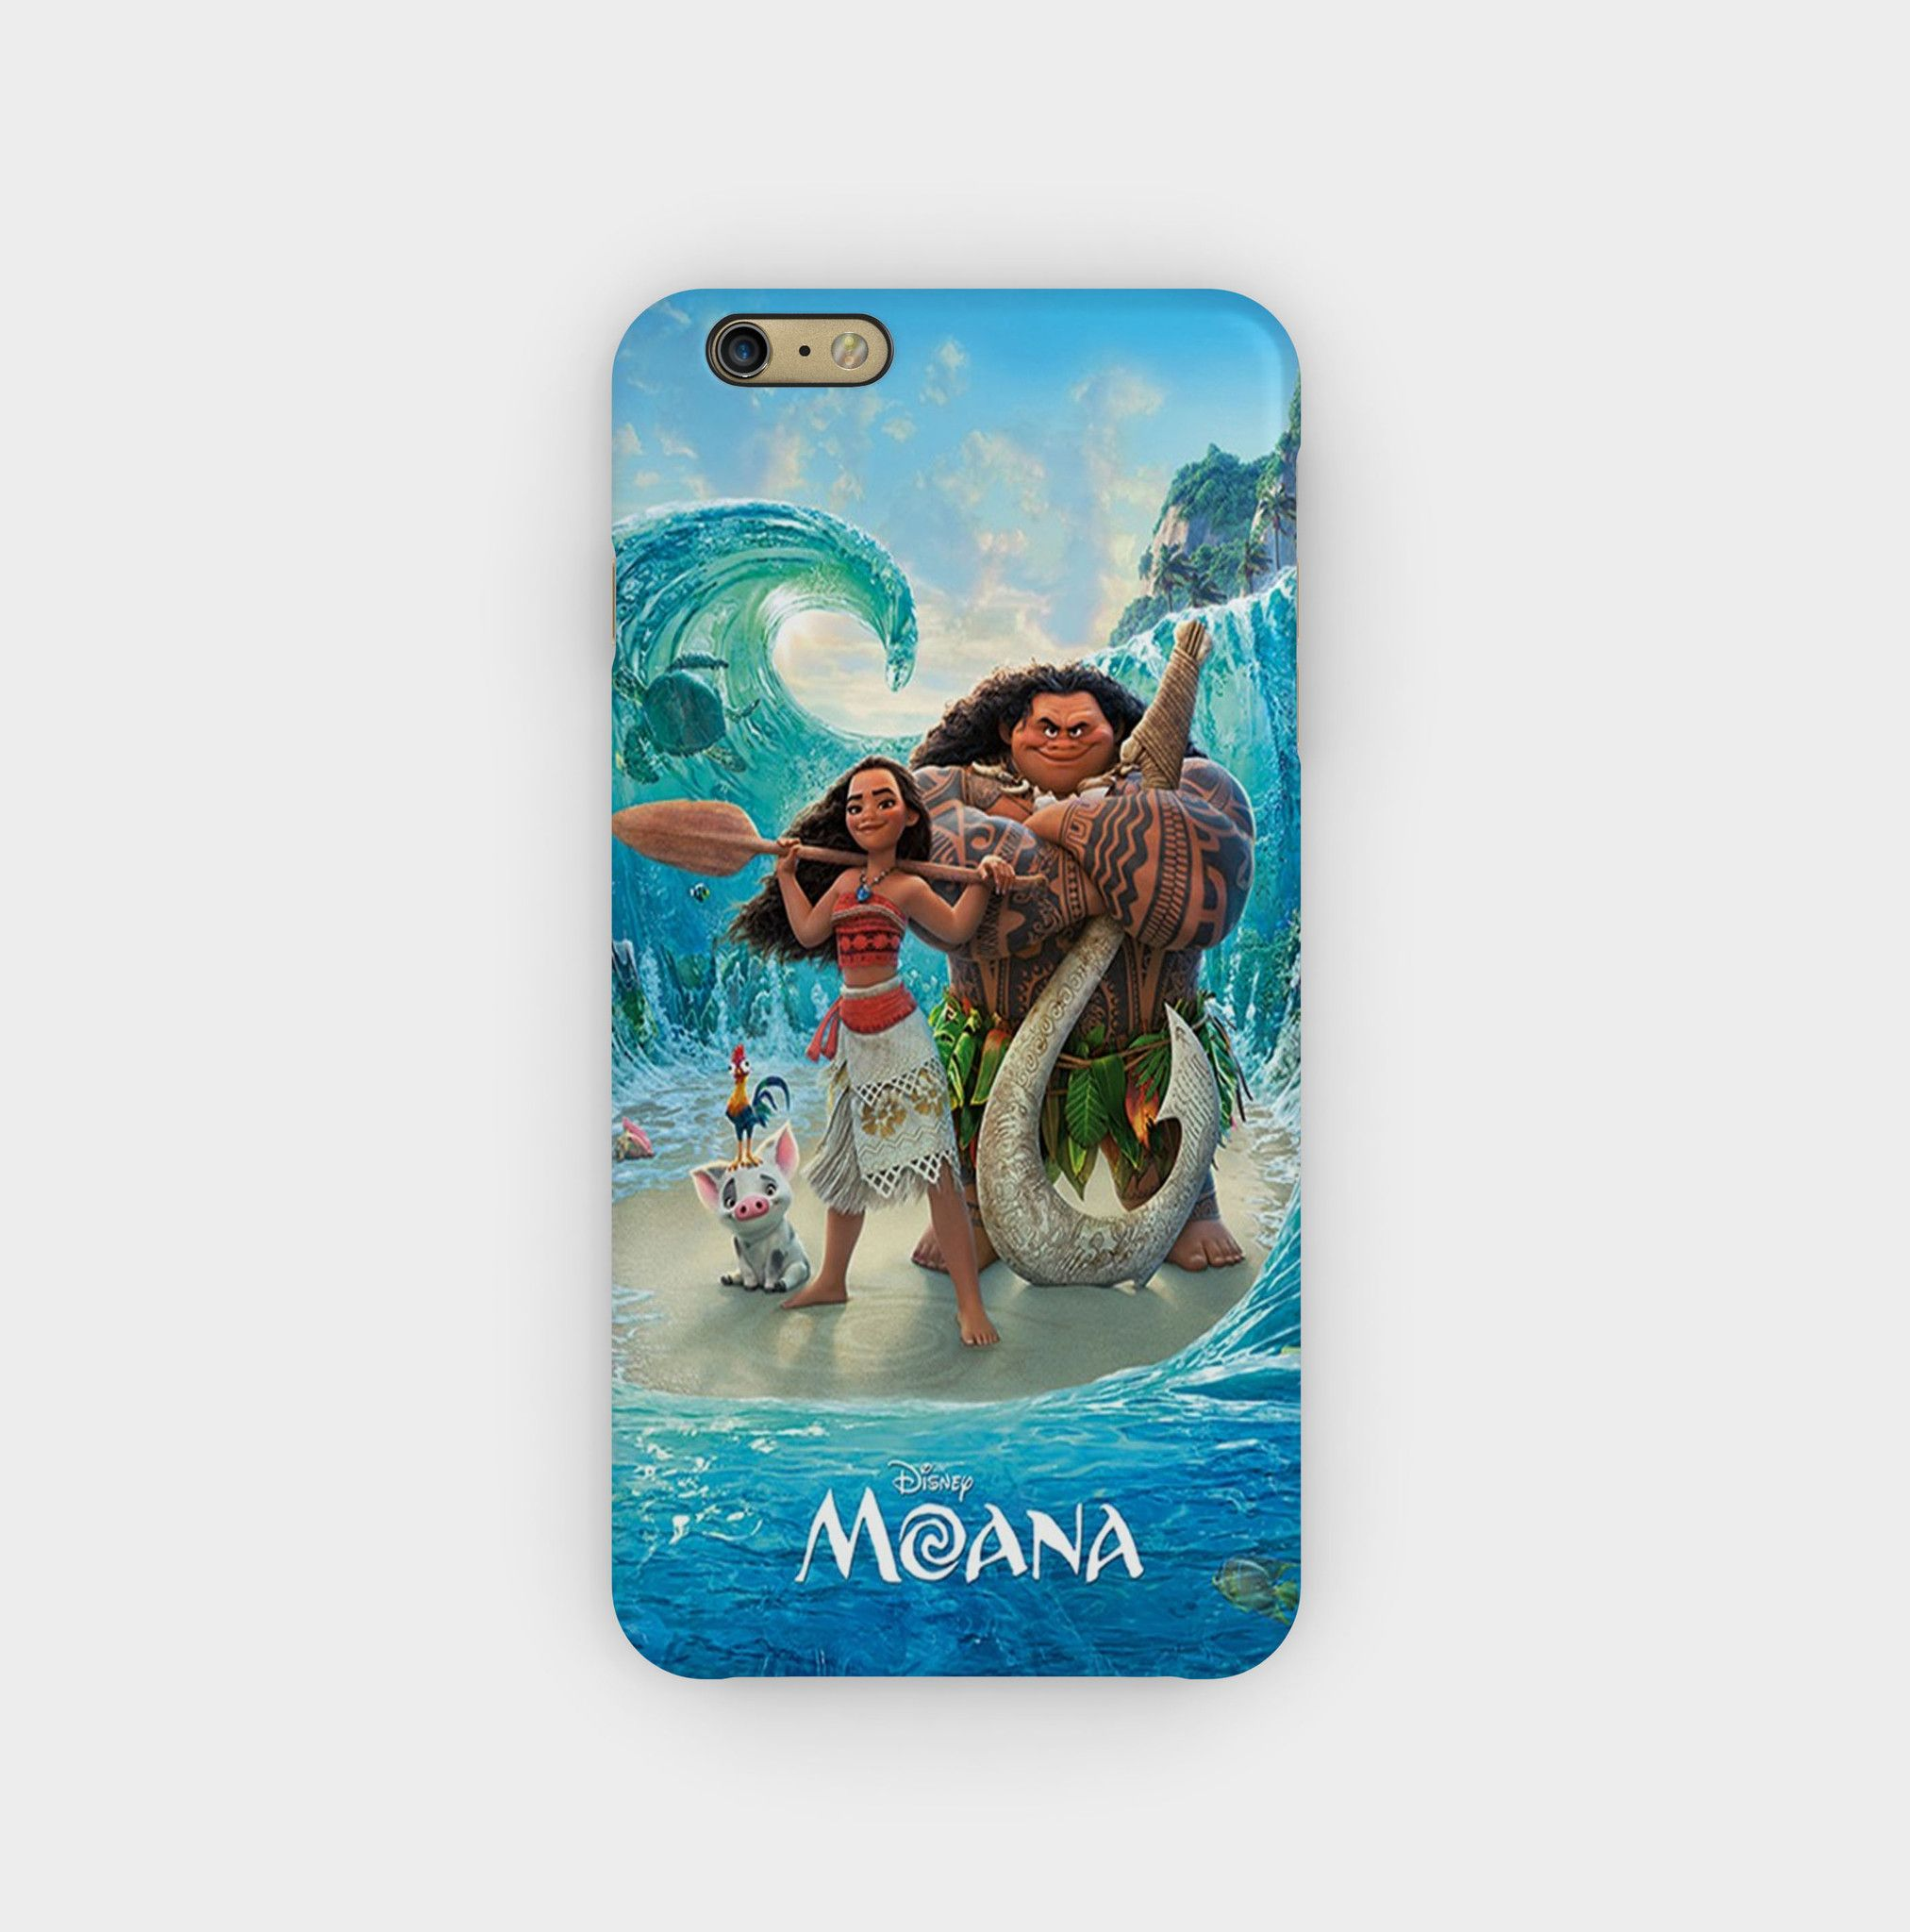 coque iphone 8 moana